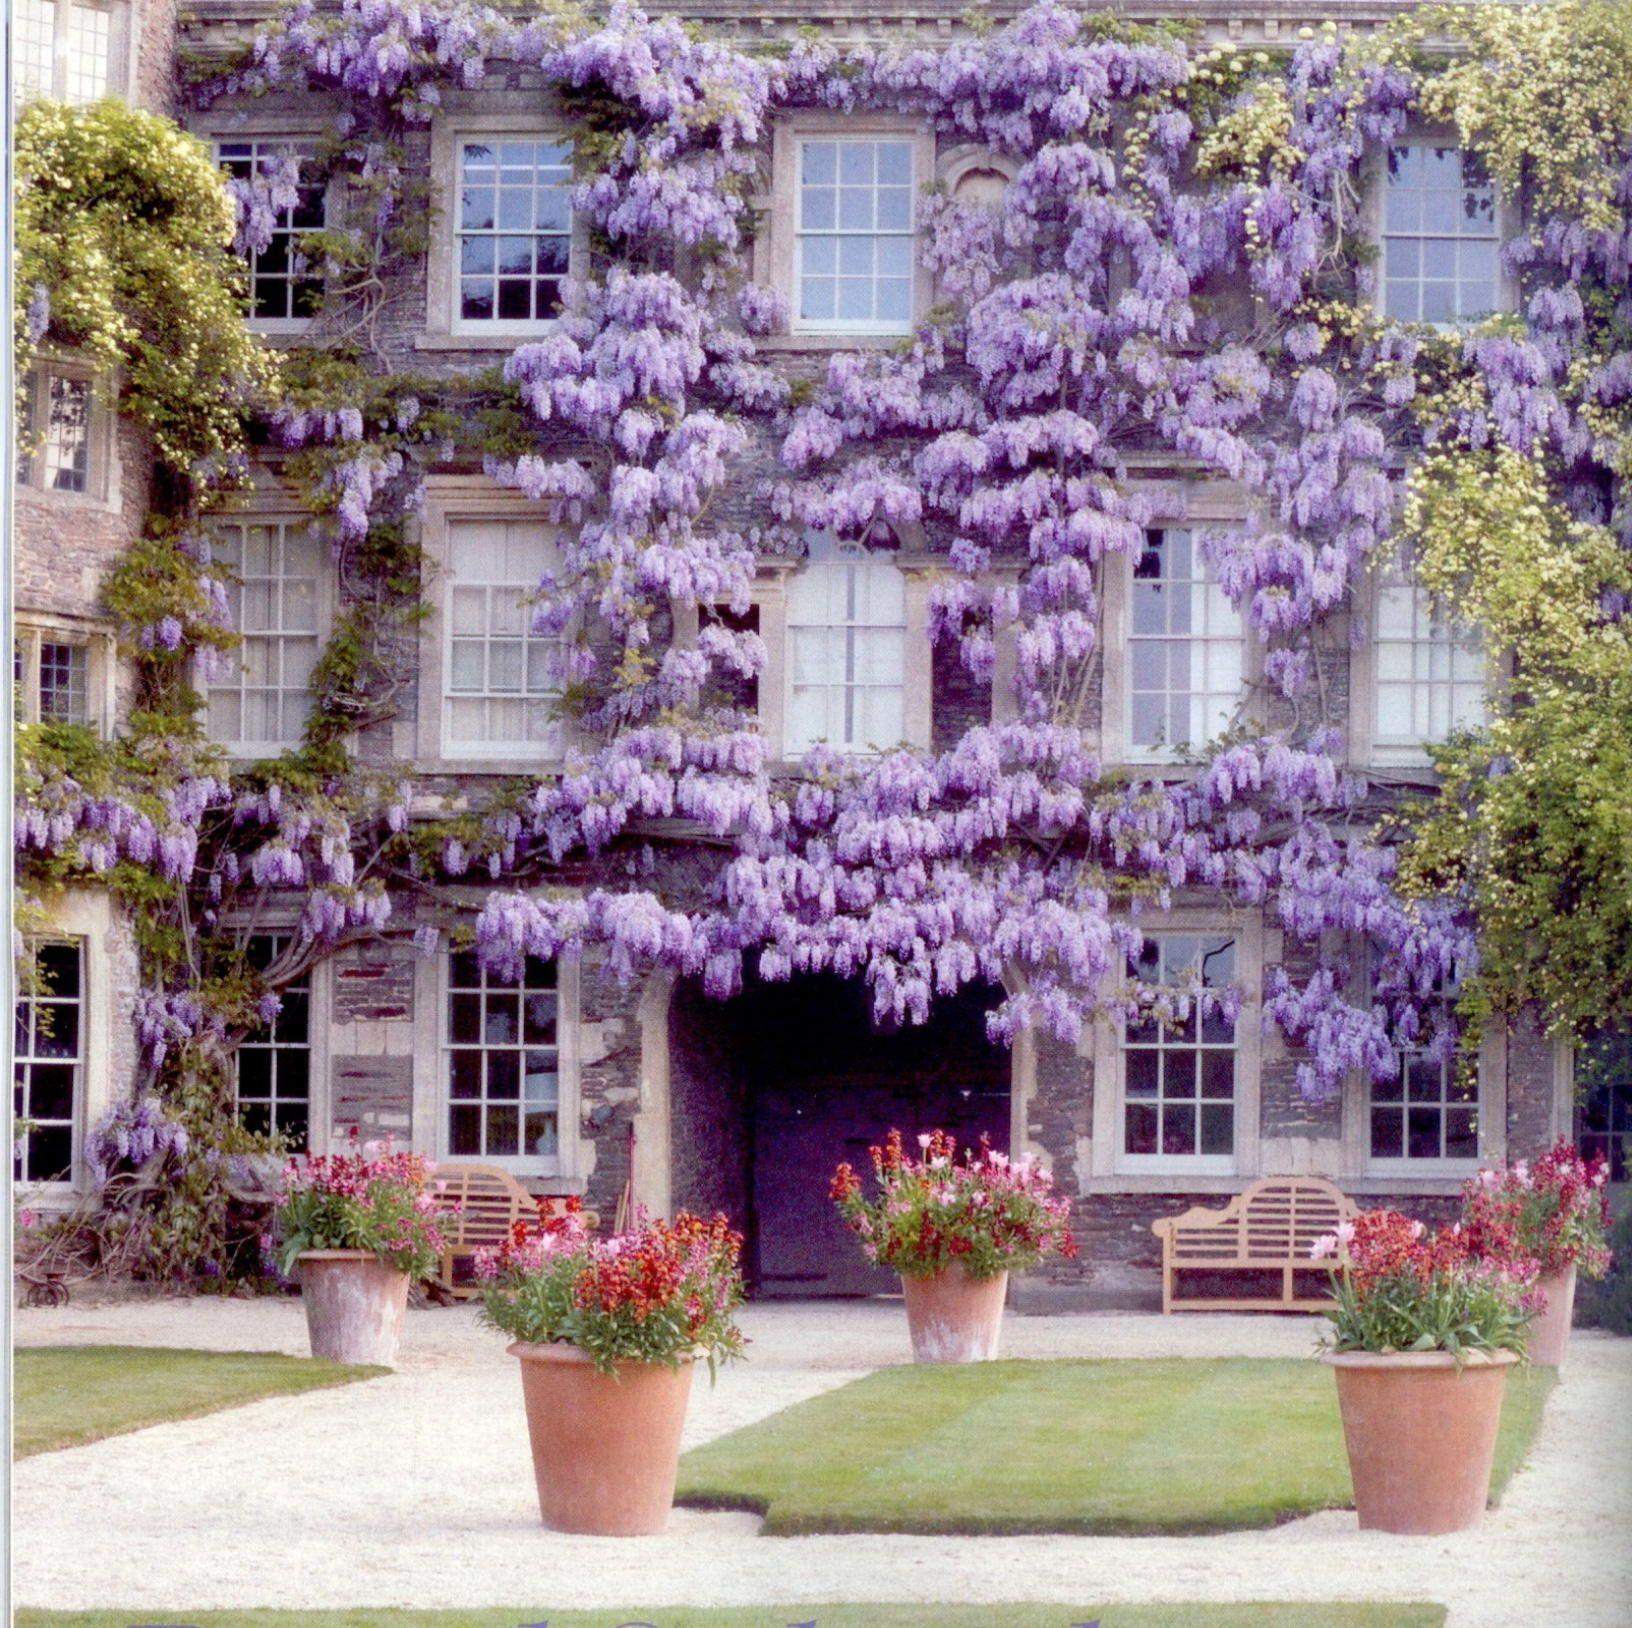 35 Best Wisteria Lodge Images On Pinterest: Hanham Court Near Bristol In South-west England